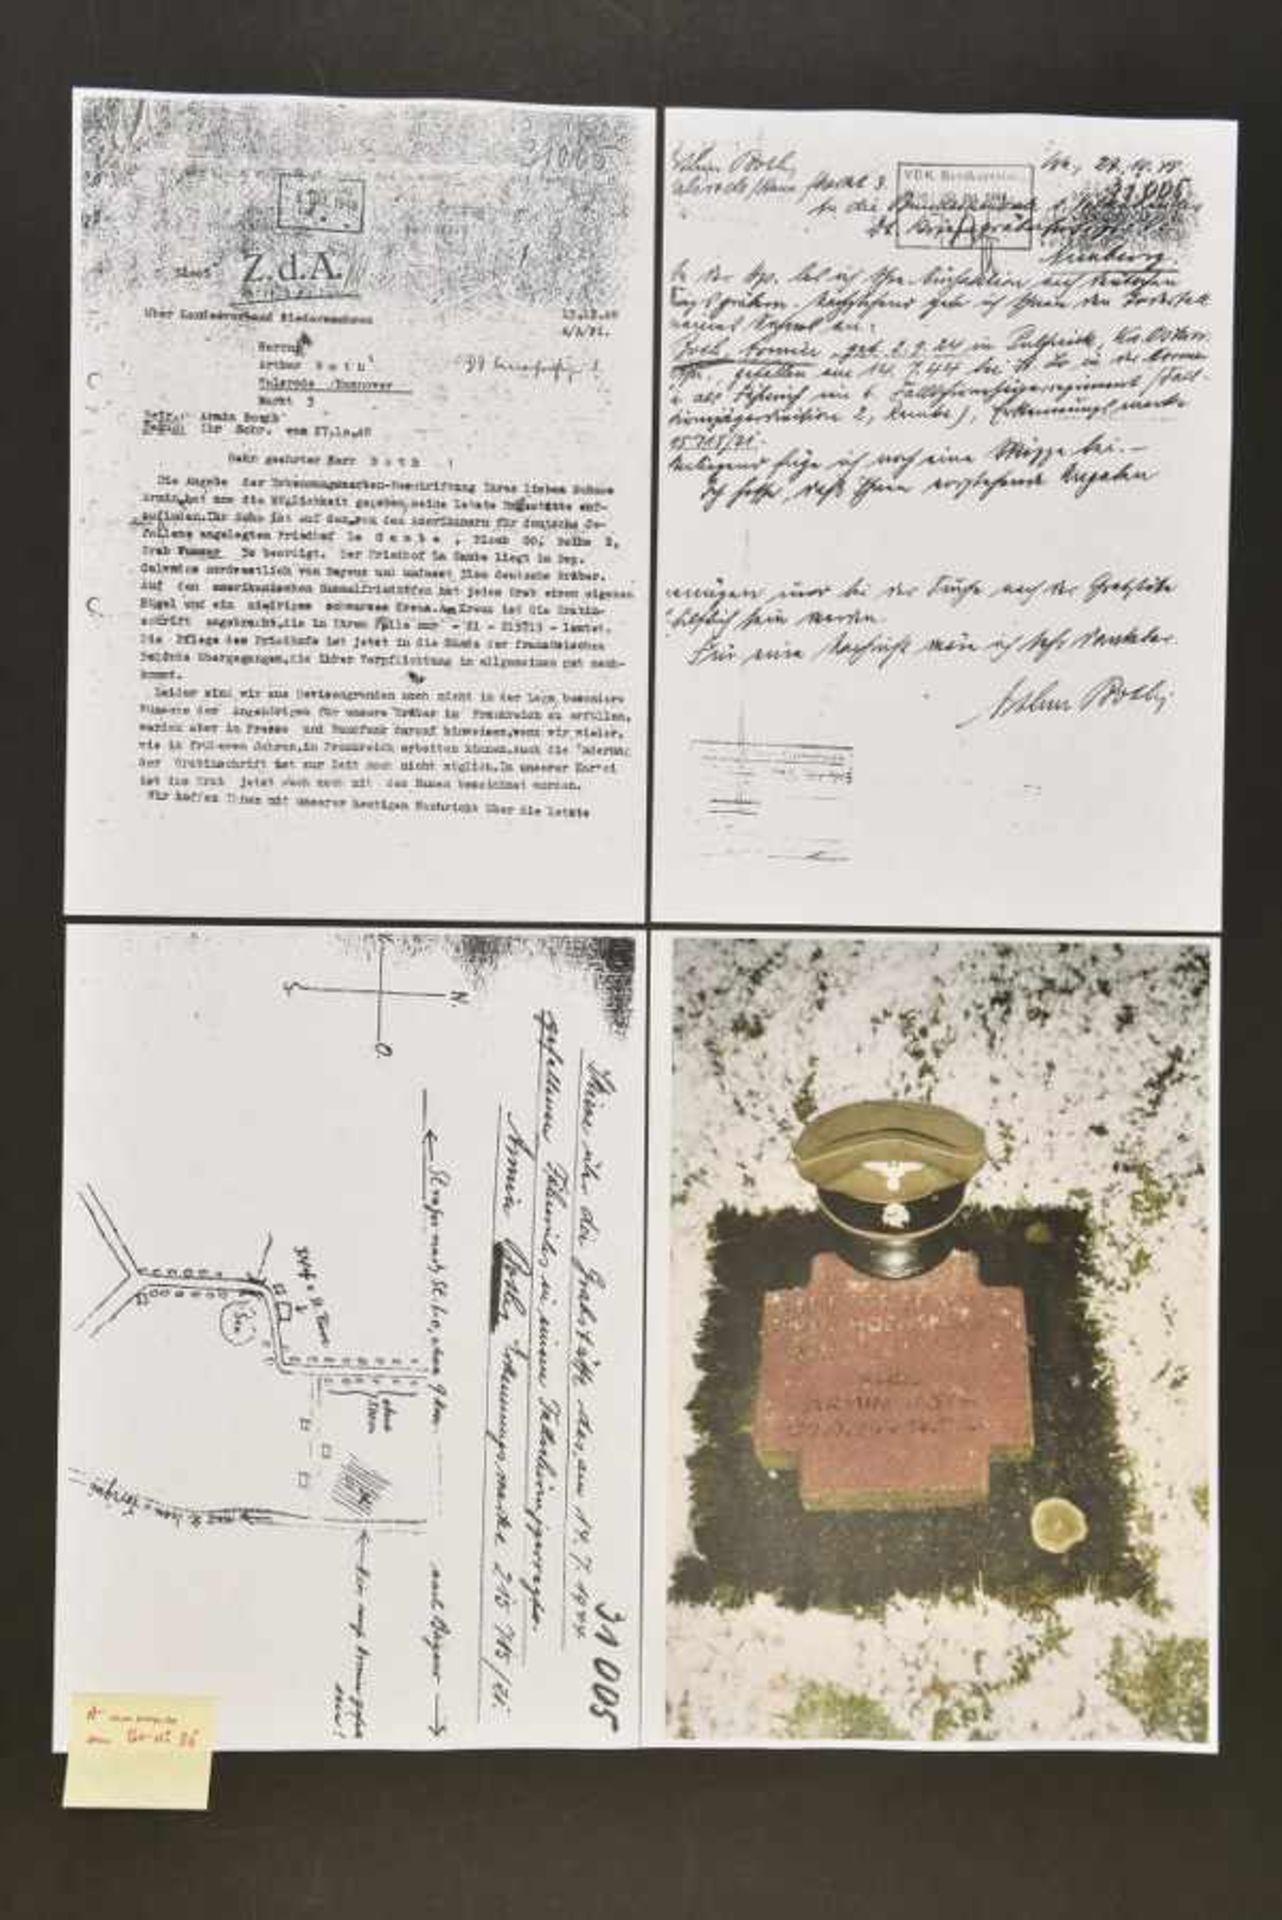 Casquette SS d'Armin Both. SS Cap belonging to Armin Both En gabardine Feldgrau, bandeau en - Bild 4 aus 4